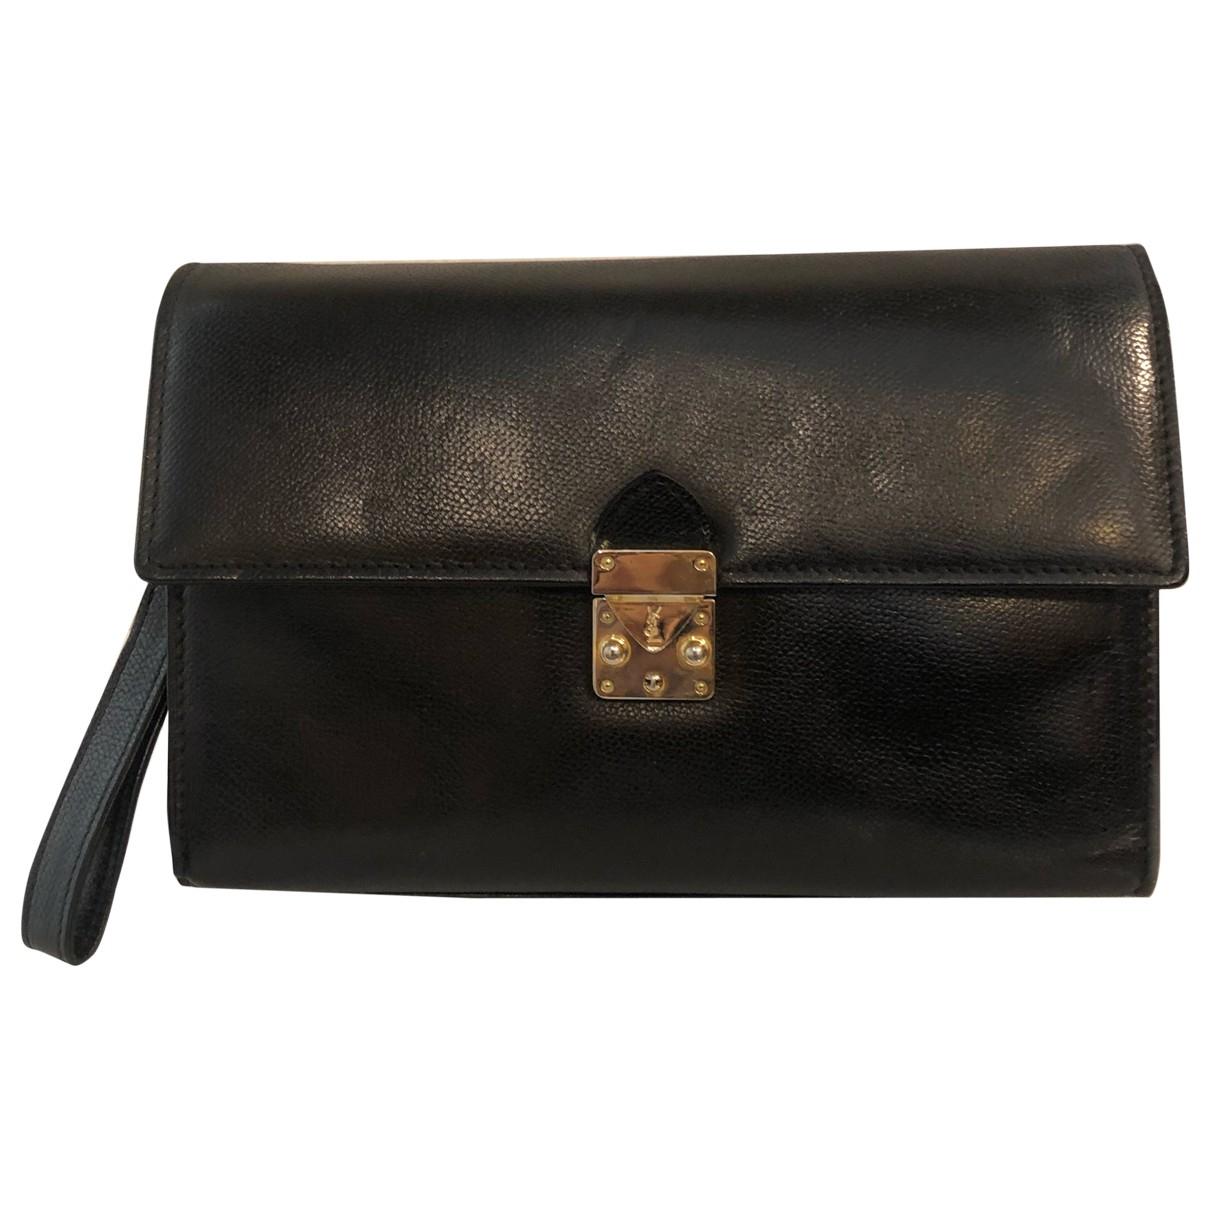 Yves Saint Laurent \N Black Leather Clutch bag for Women \N